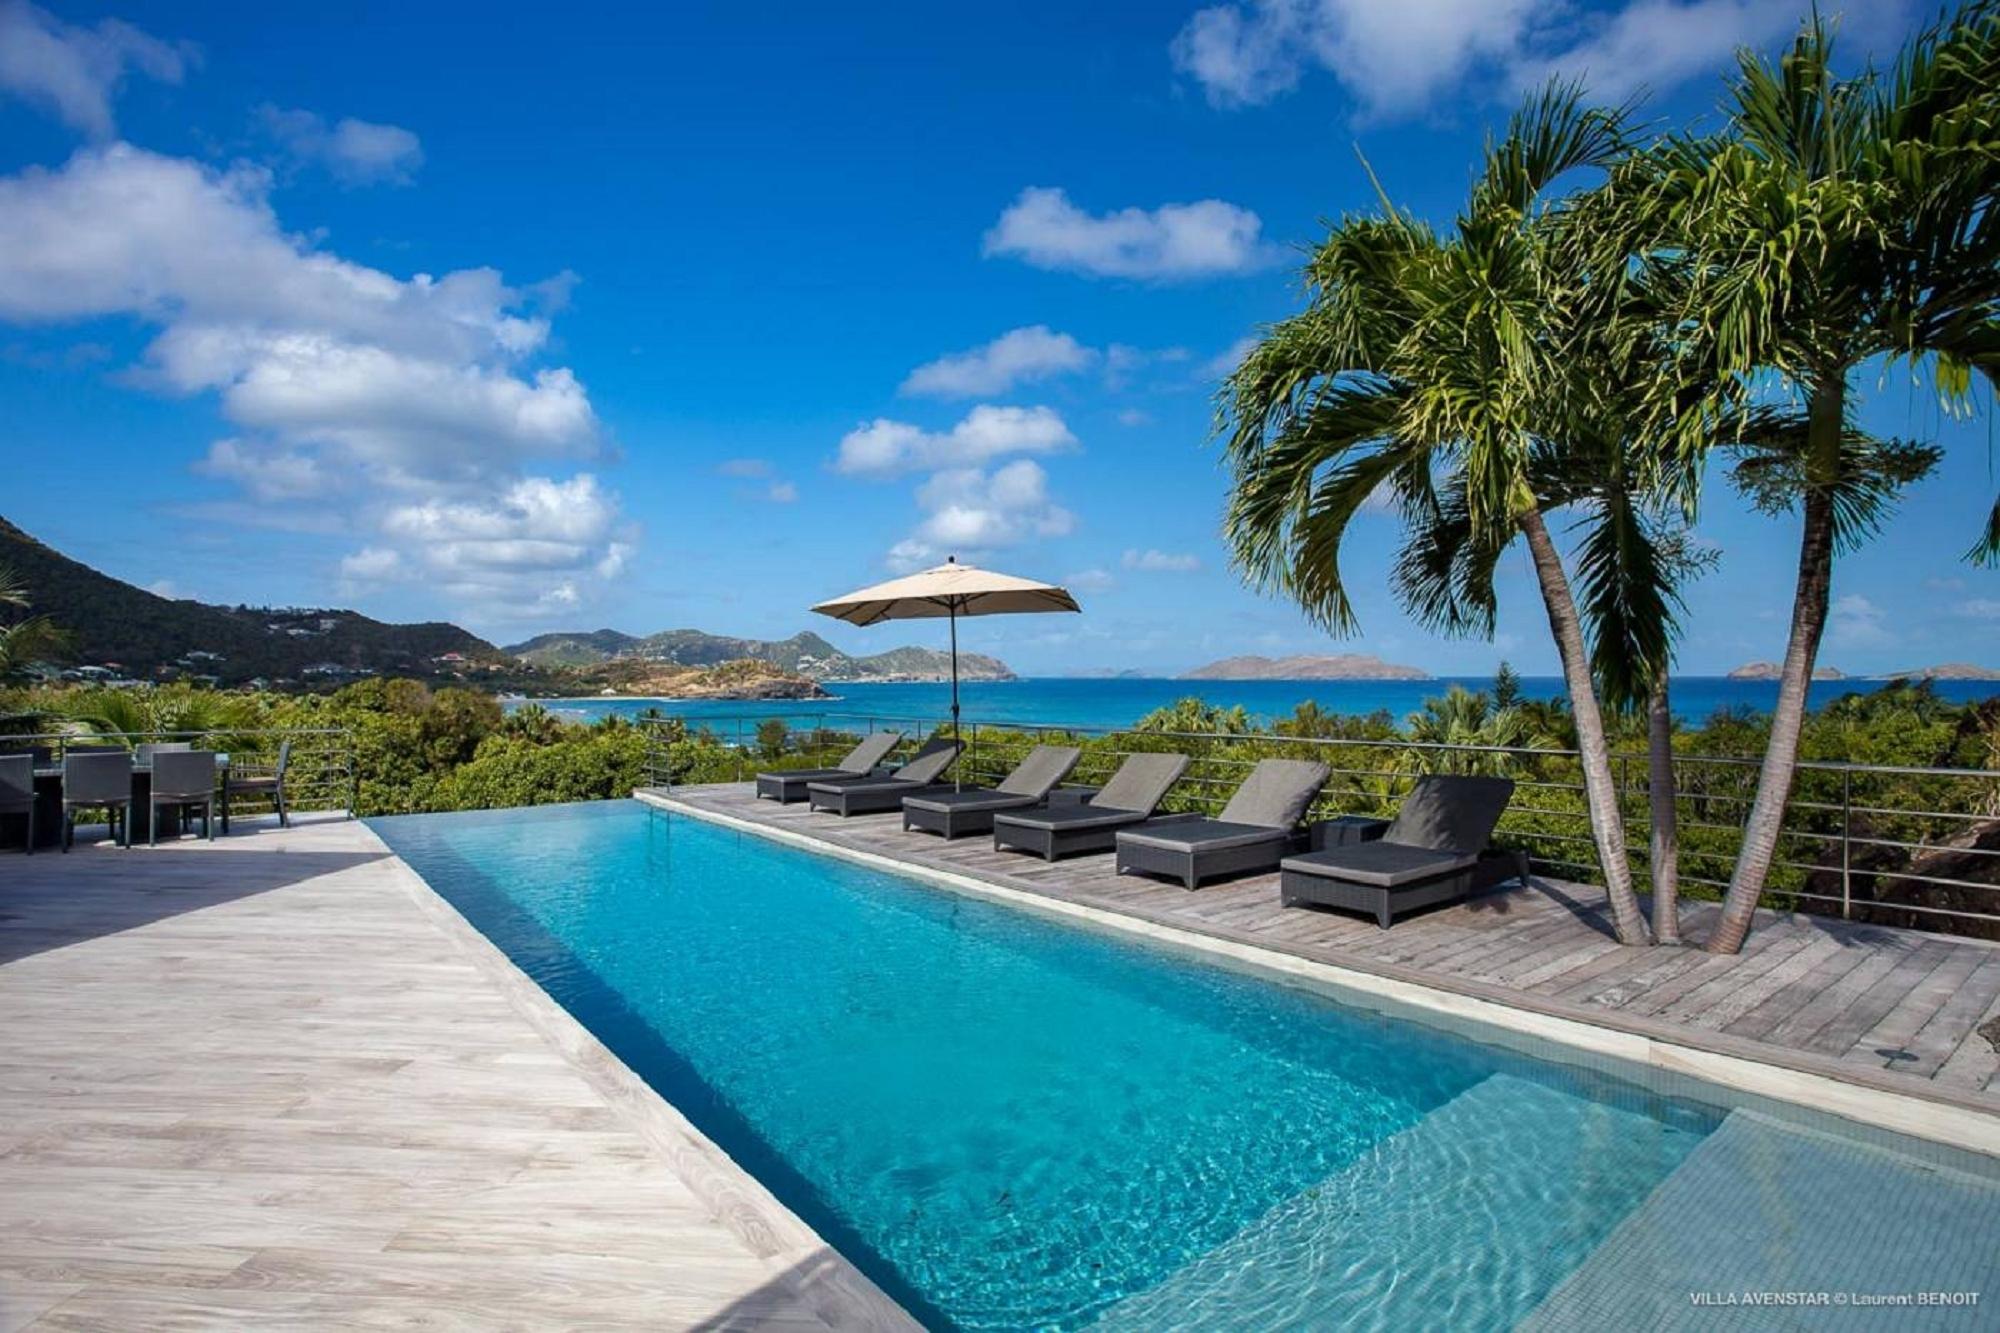 Villa Avenstar 5 BR - Camaruche, St Barth / St Barts rental For Super Rich